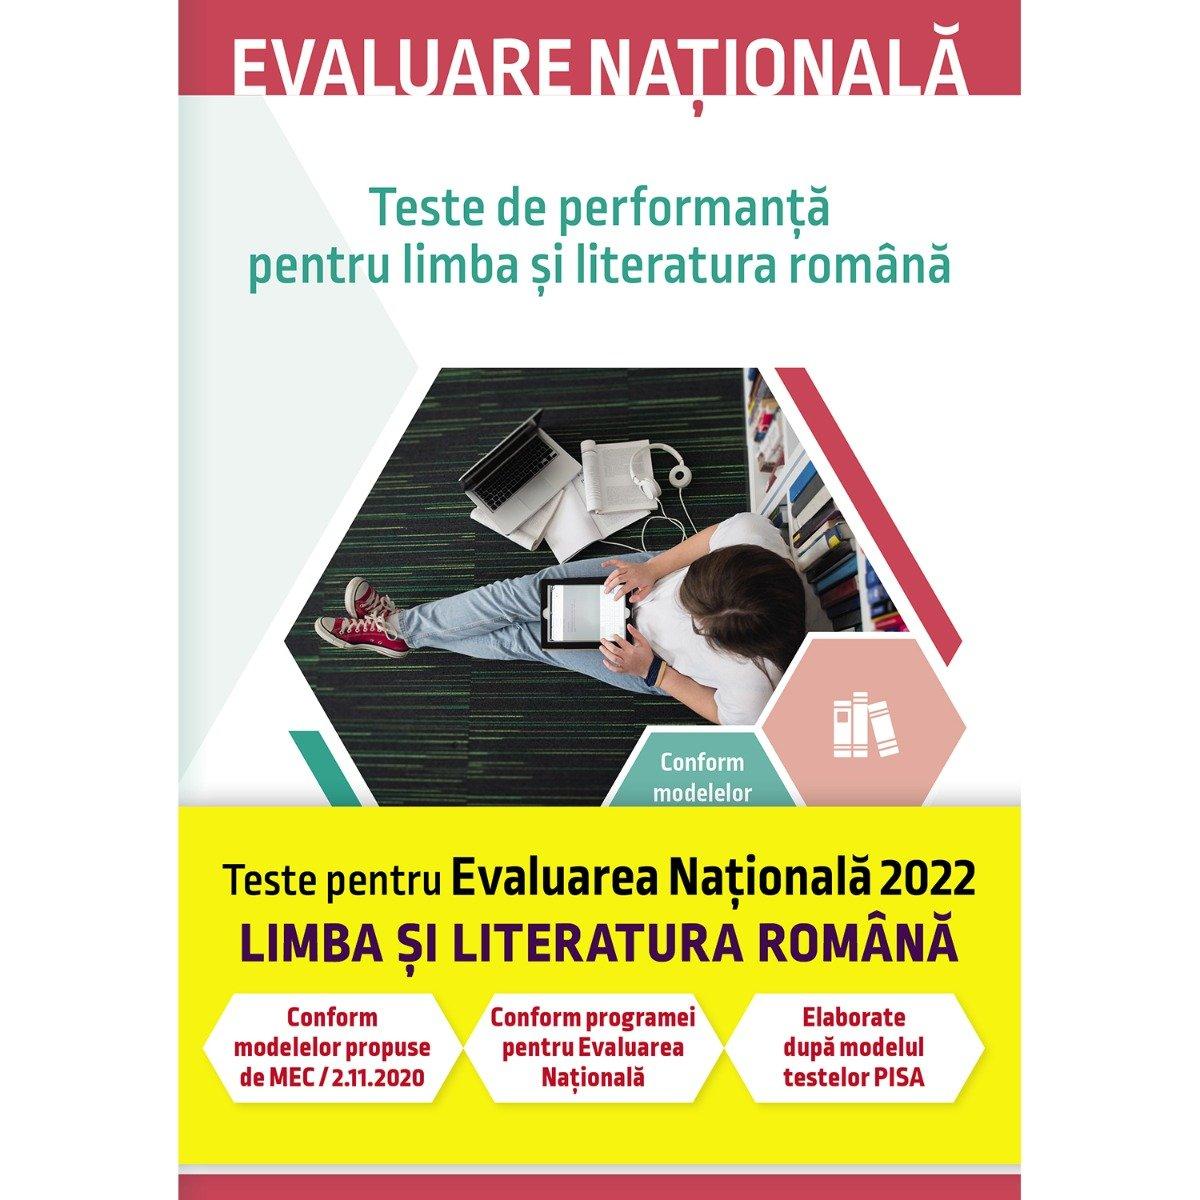 Evaluare nationala, Limba si literatura romana, Teste de performanta 2022, Delia-Monica Georgescu